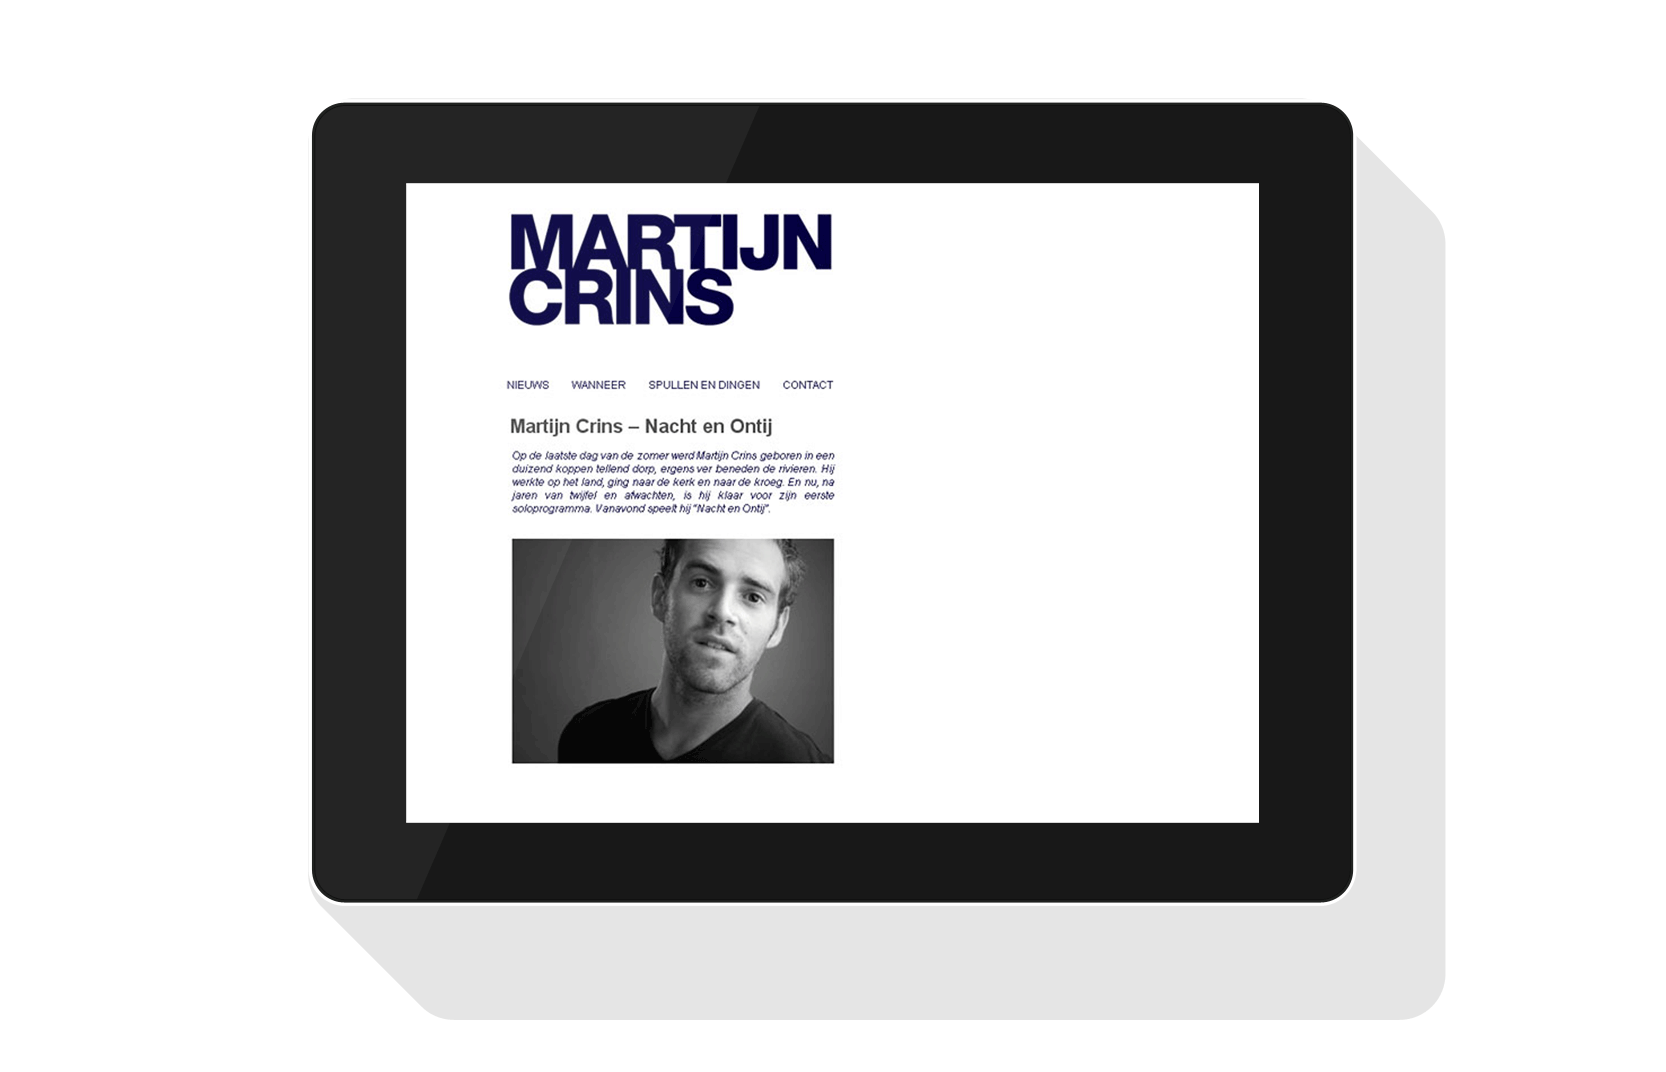 multi_martijncrins_site